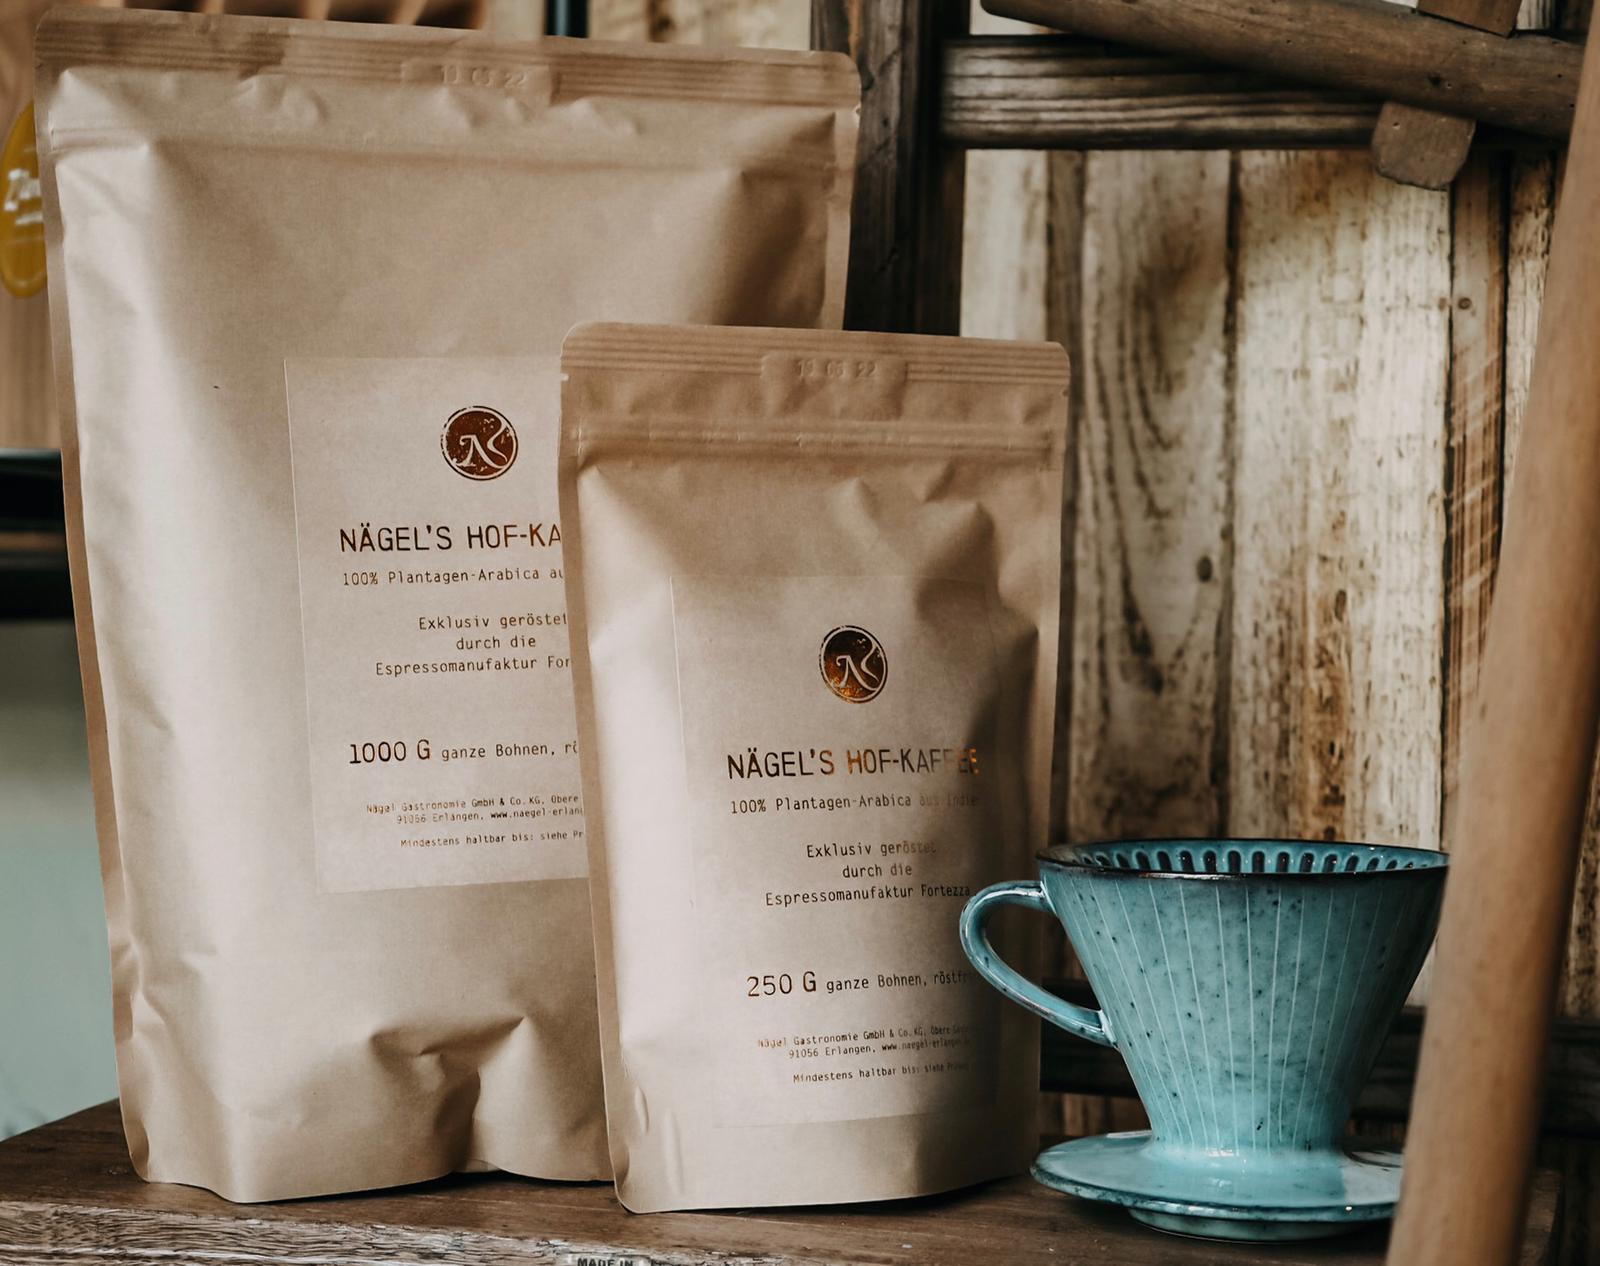 Tüten mit Nägels Hof-Kaffee